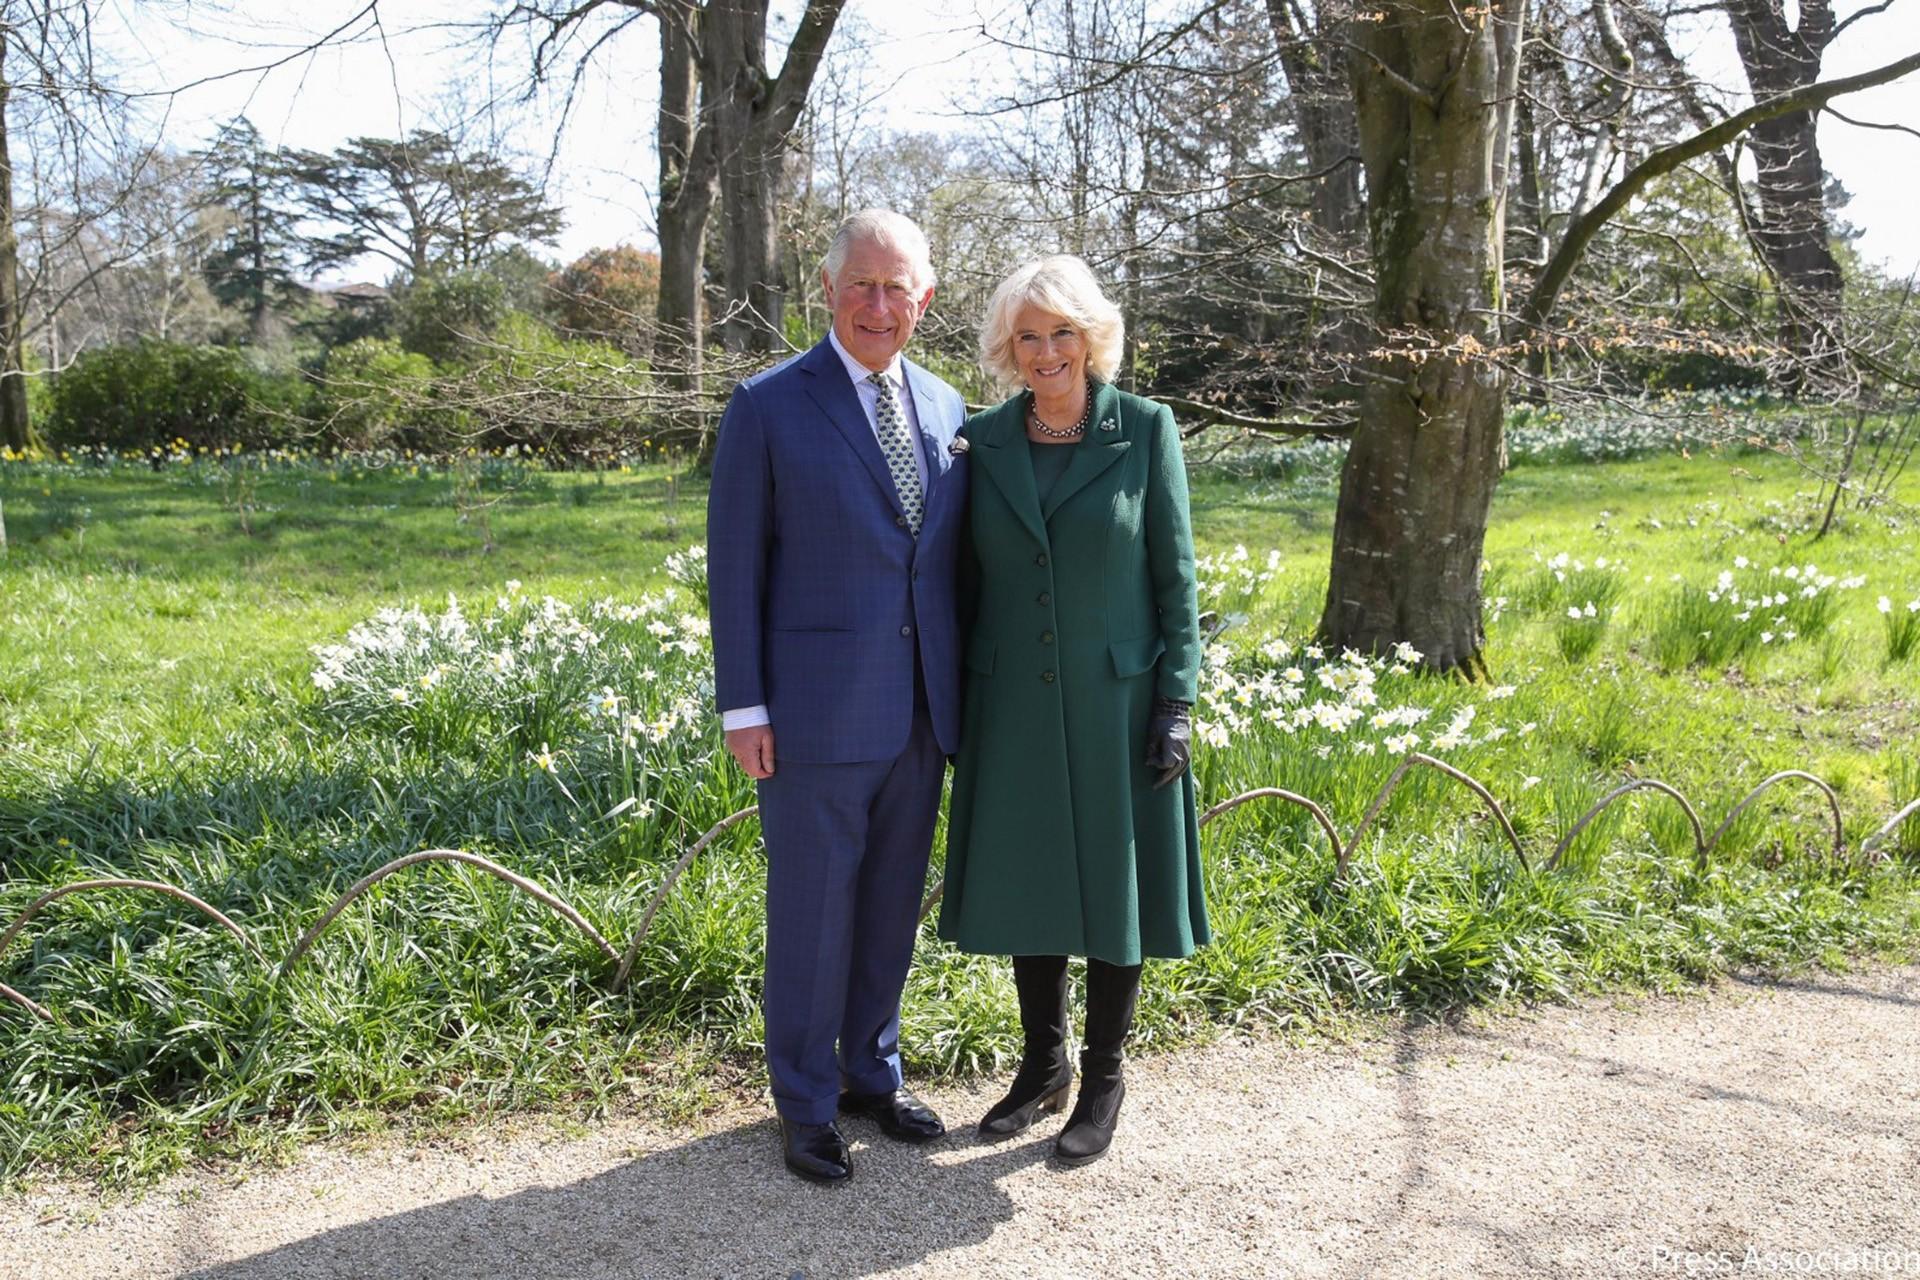 Charles ve eşi Camilla